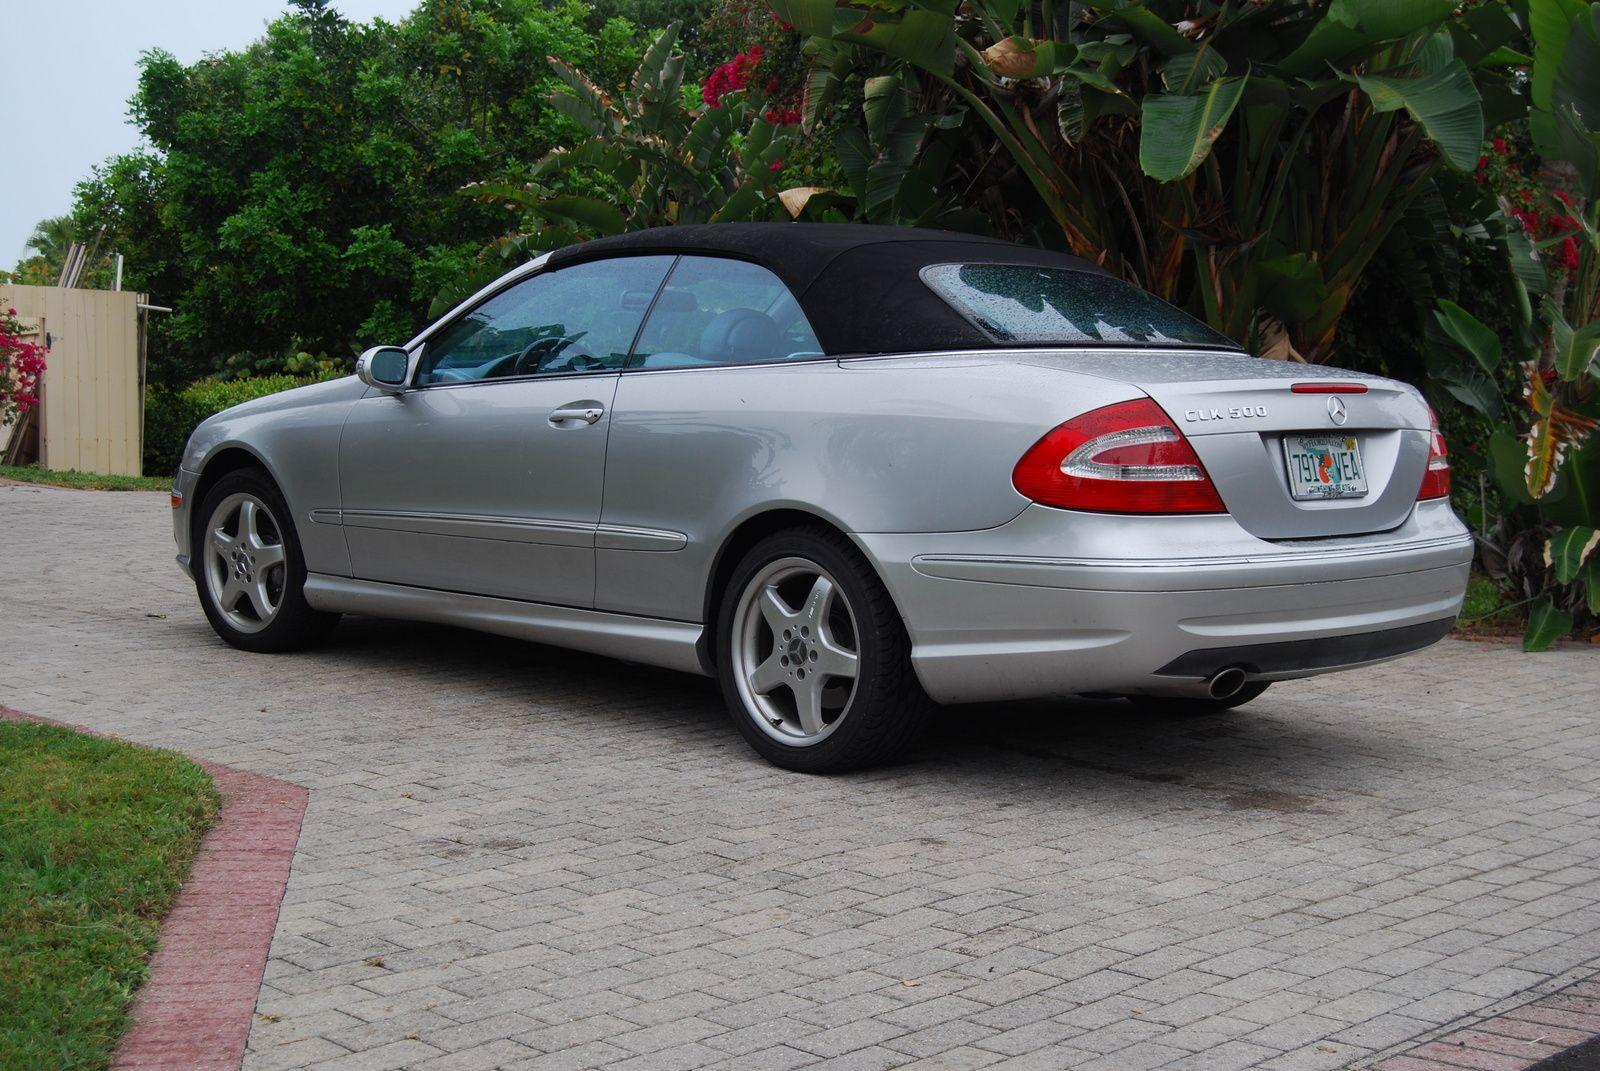 2004 Mercedes Benz Clk Class Pictures Mercedes Benz Mercedes Benz Convertible Mercedes Clk